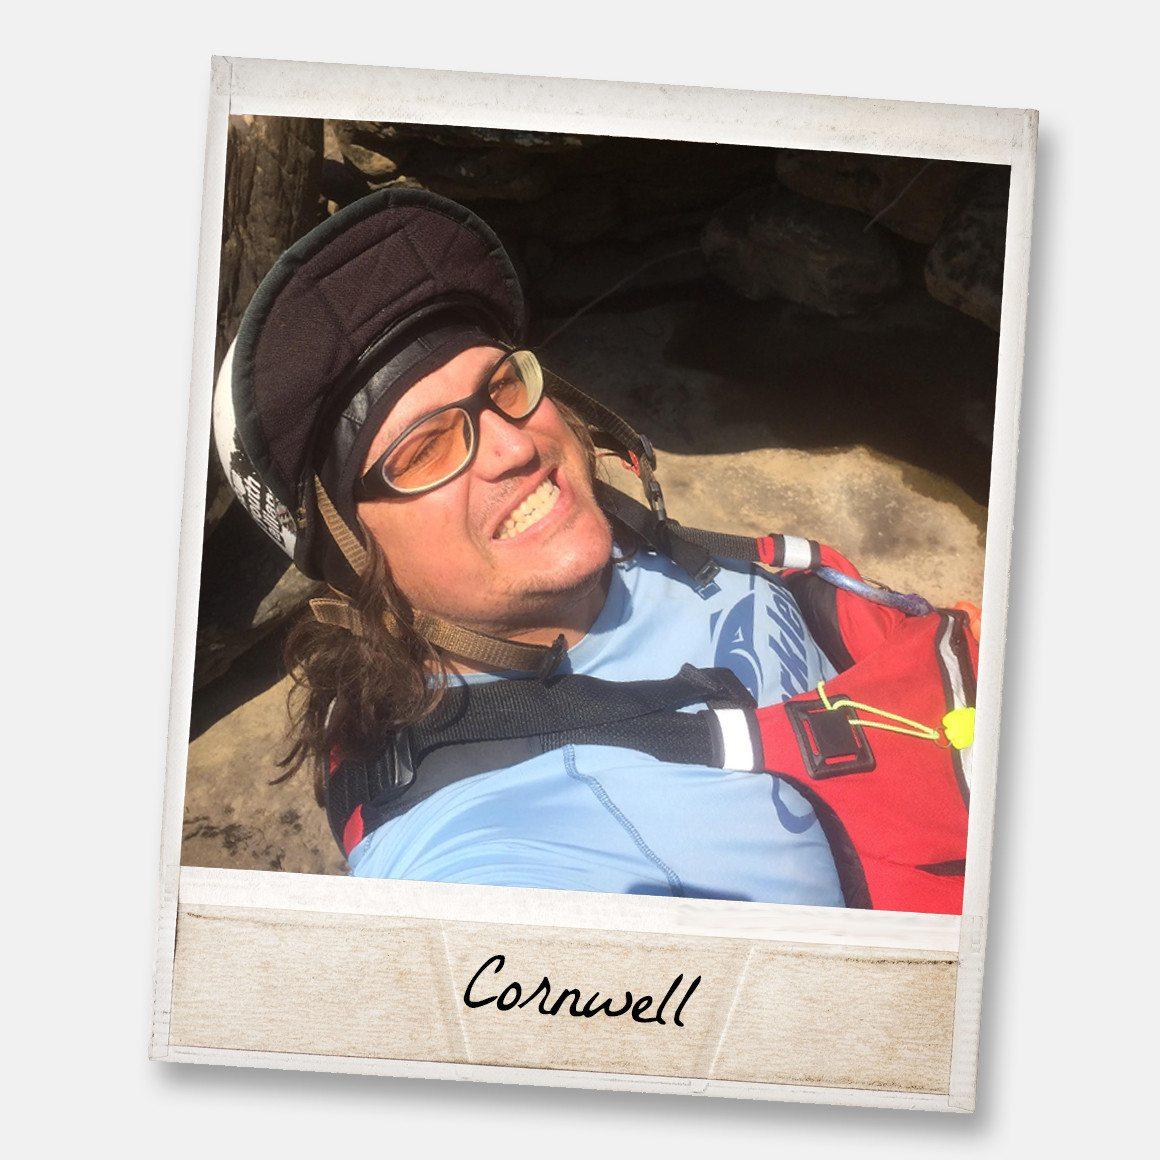 Cornwell's sunny sunshine face